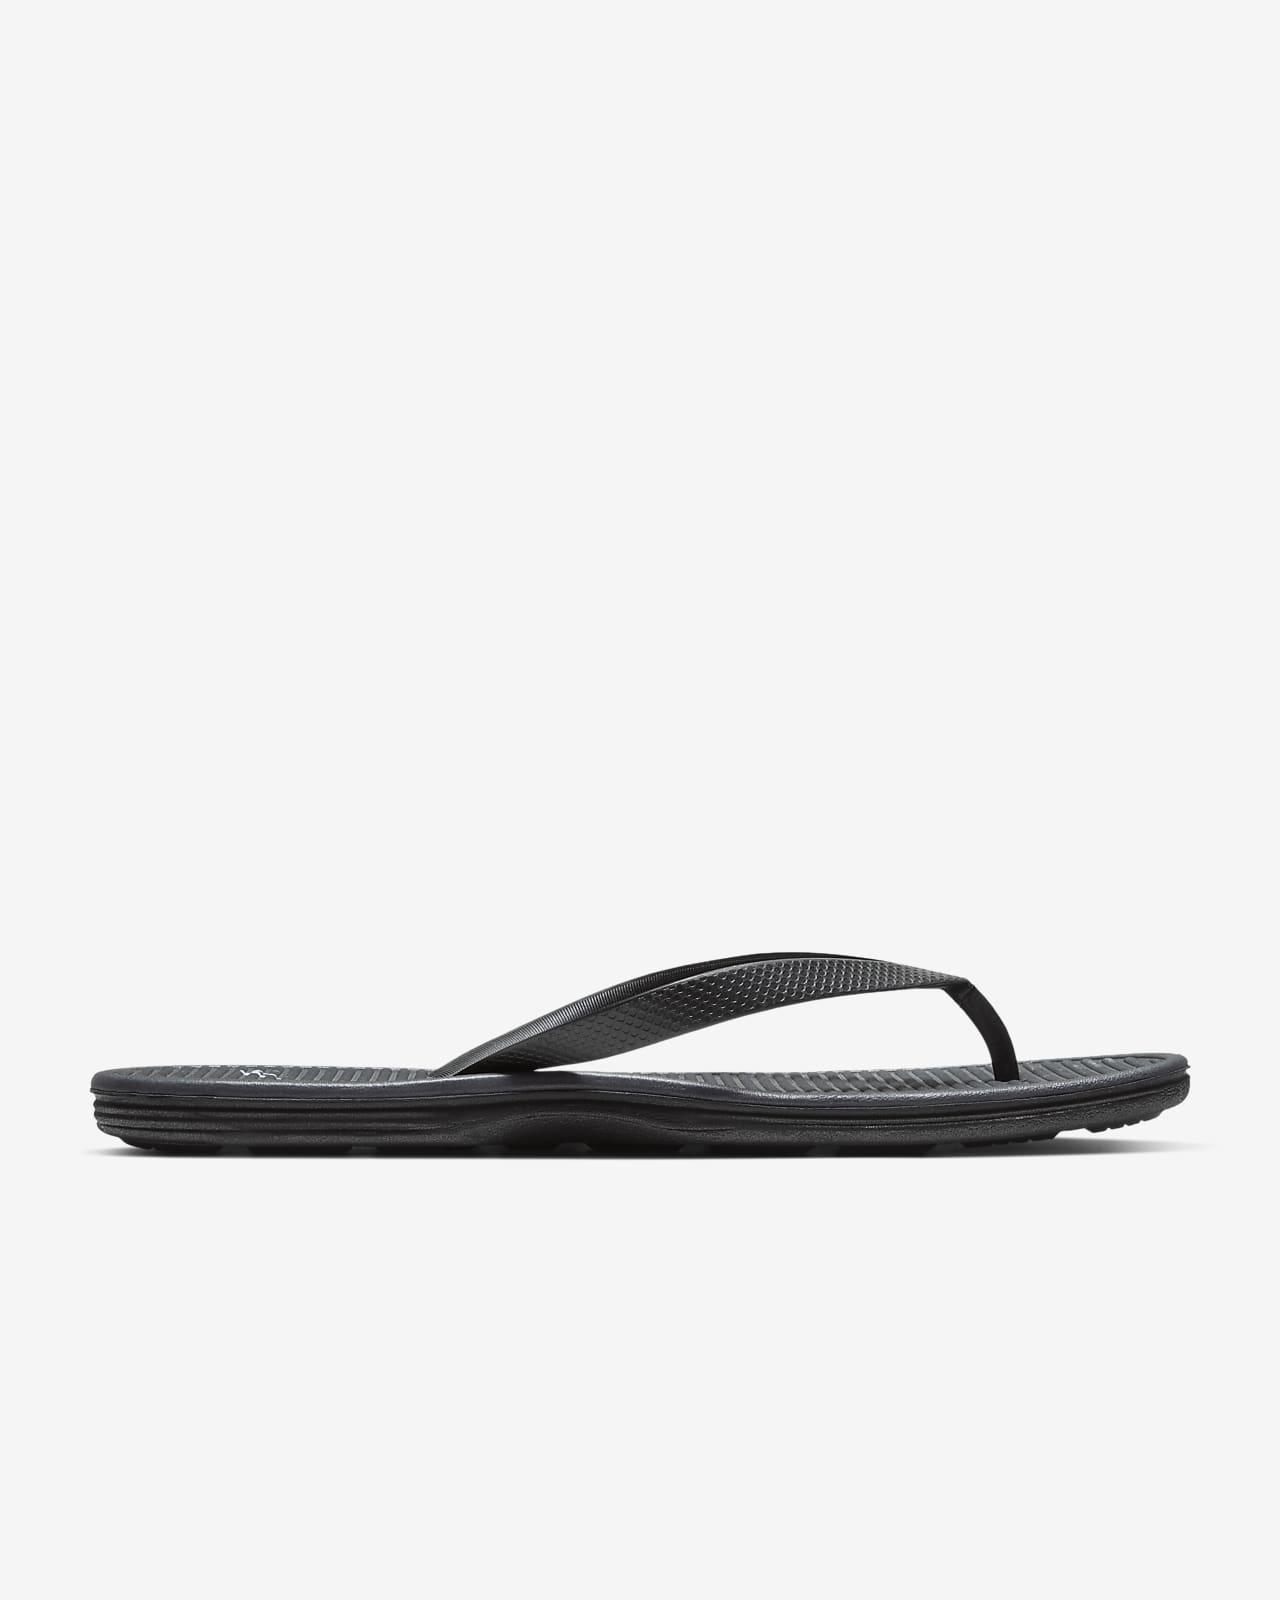 Nike Solarsoft 2 Men's Flip-Flop. Nike LU